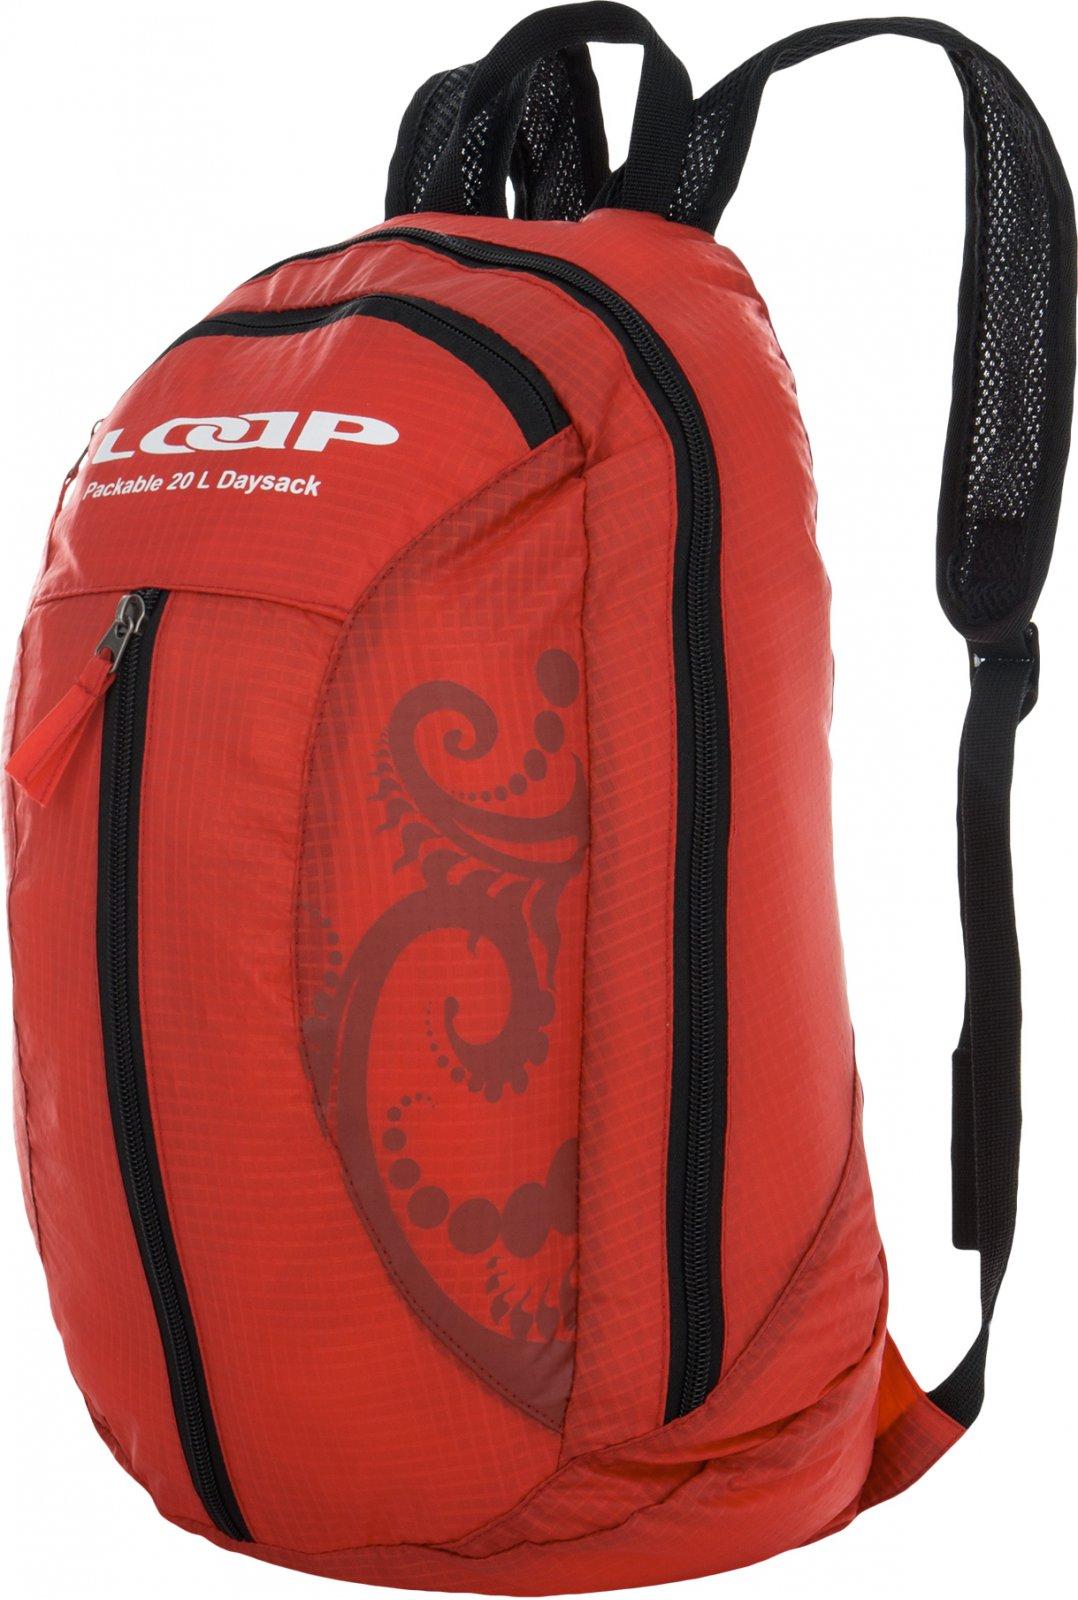 Loap balitelný batoh Circular • Zboží.cz 9e4a8053a4